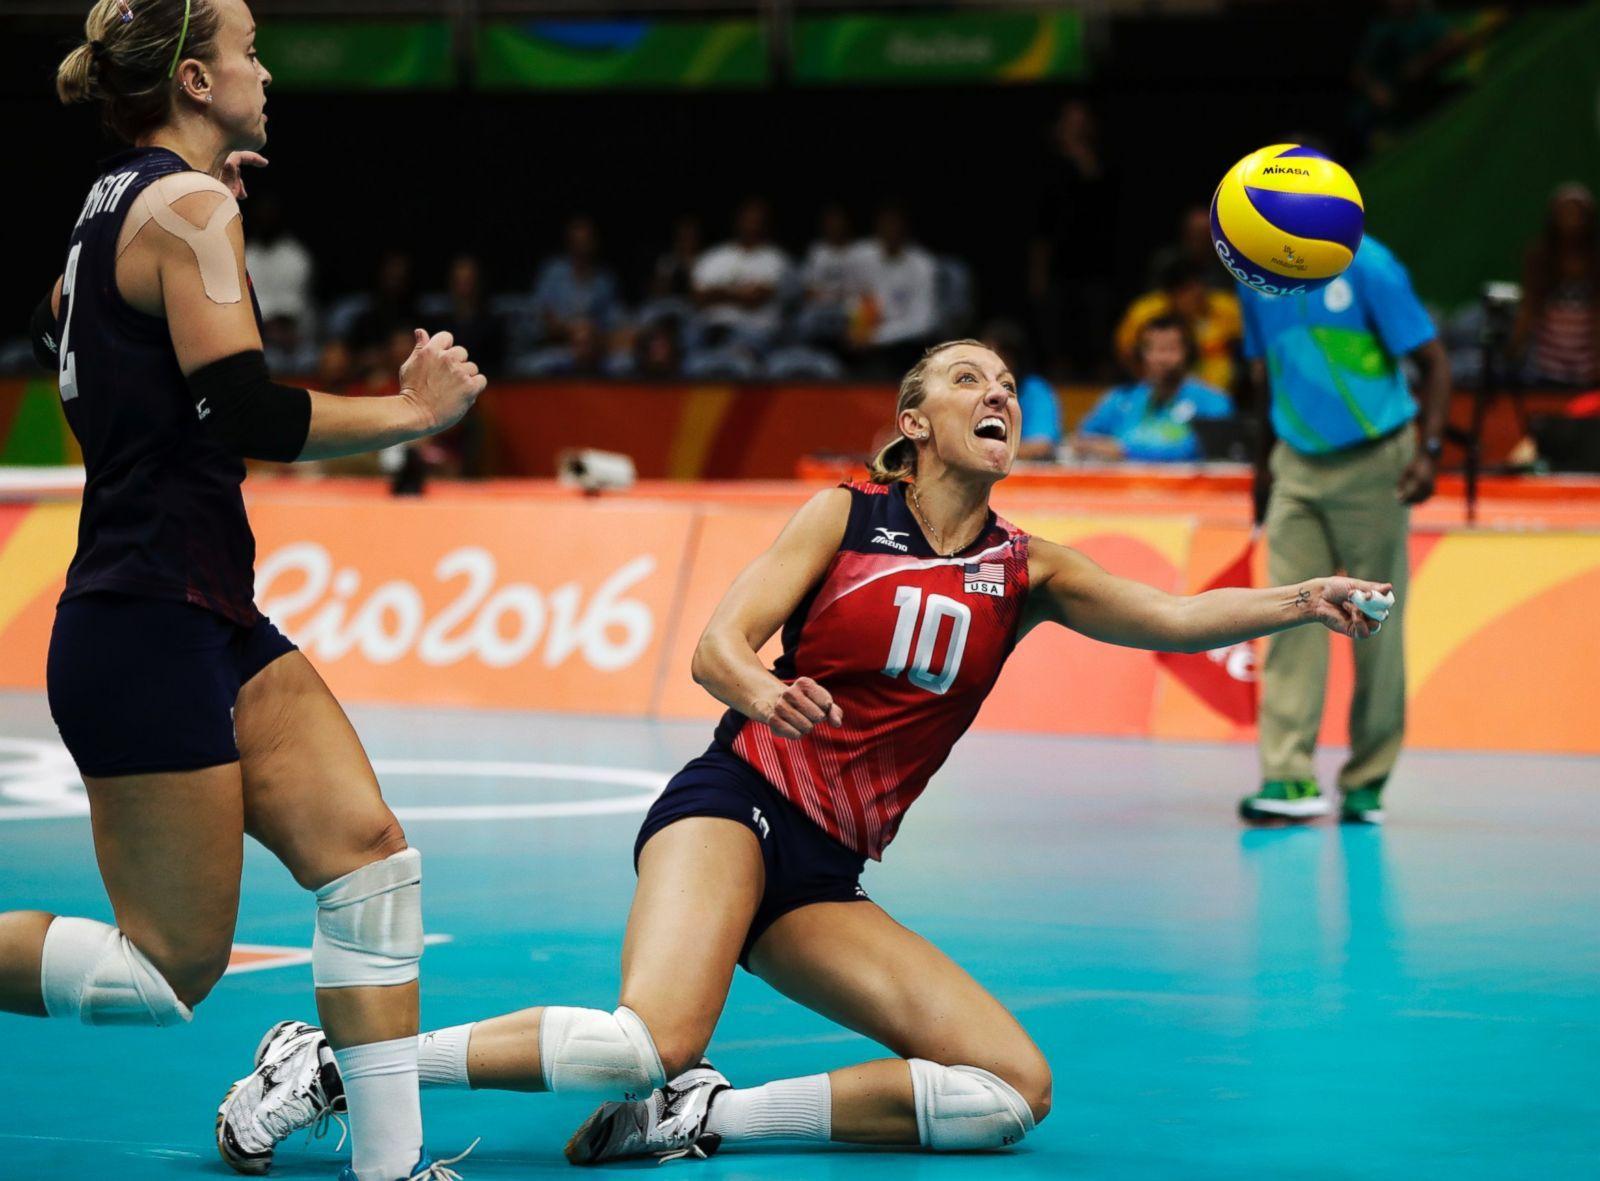 United States Jordan Larson Dives For The Ball As Kayla Banwarth Follows During Rio Olympics Rio Olympics 2016 Olympics 2016